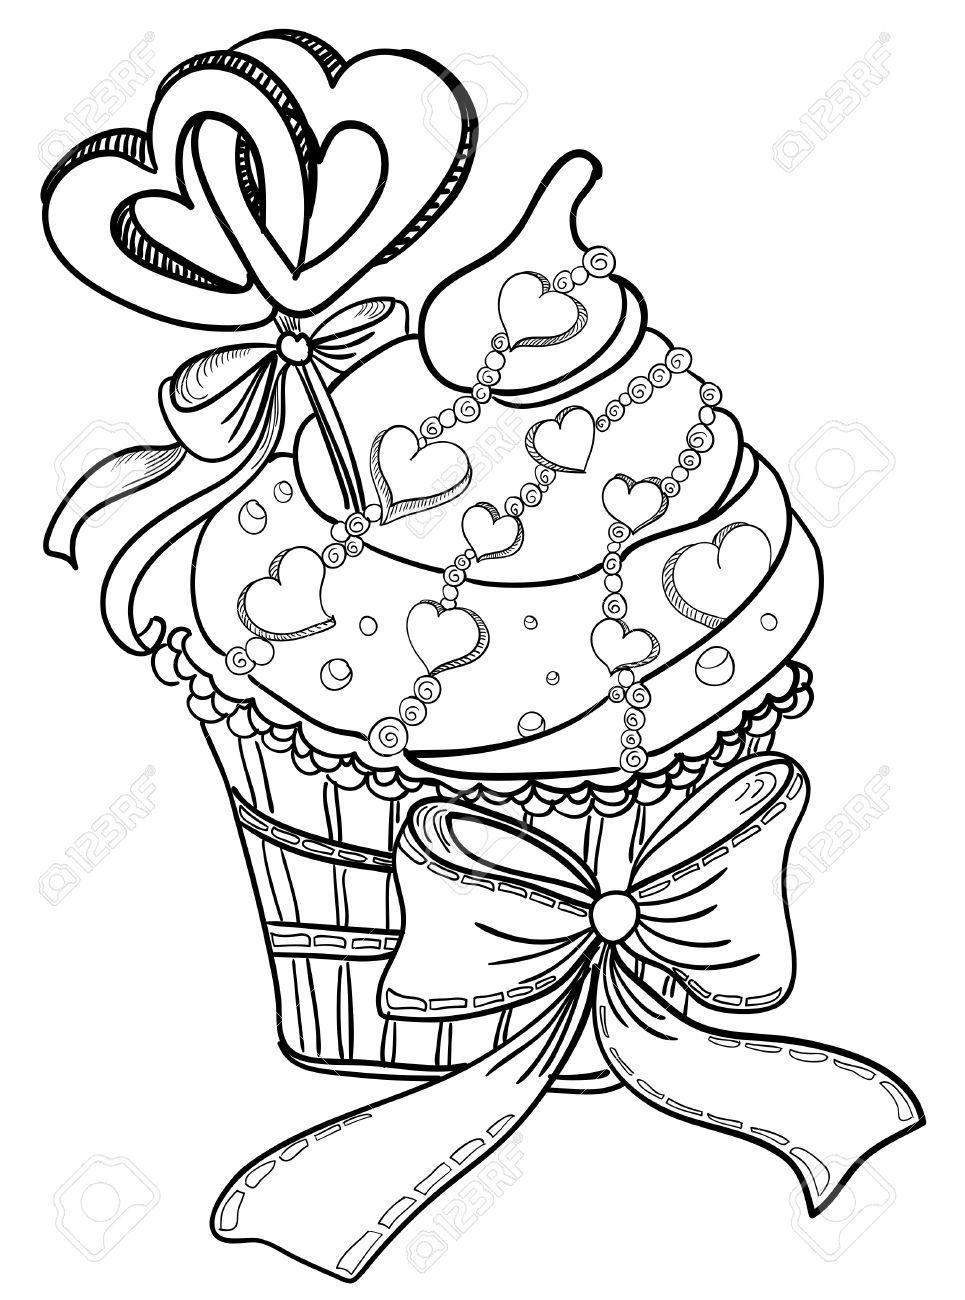 Vector hand drawing cupcake with hearts | Dibujitos | Pinterest ...